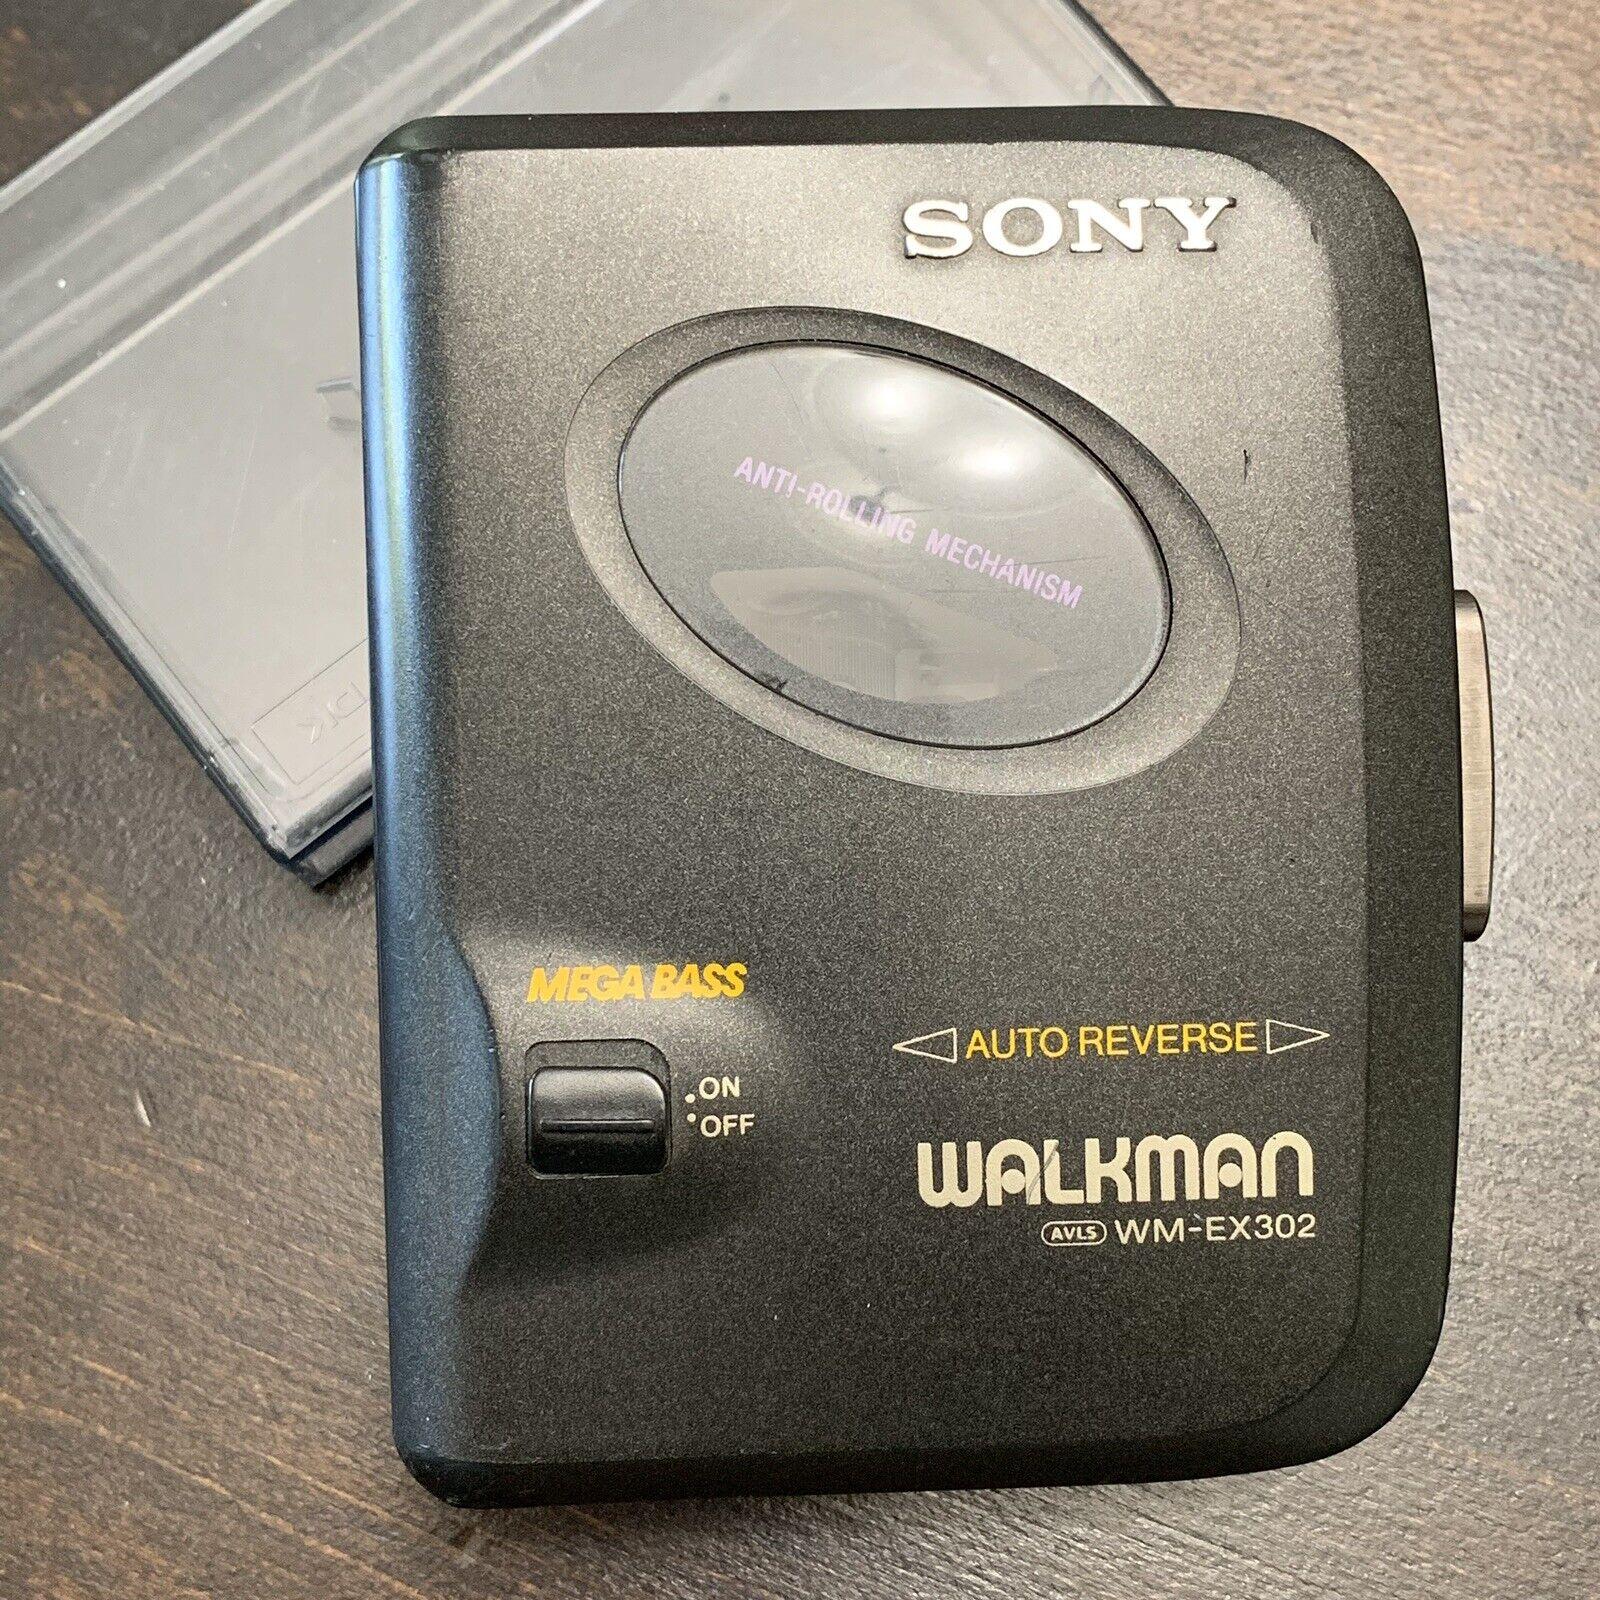 Sony WM-EX190 Walkman Stereo Cassette Player with Anti-Rolling Mechanism